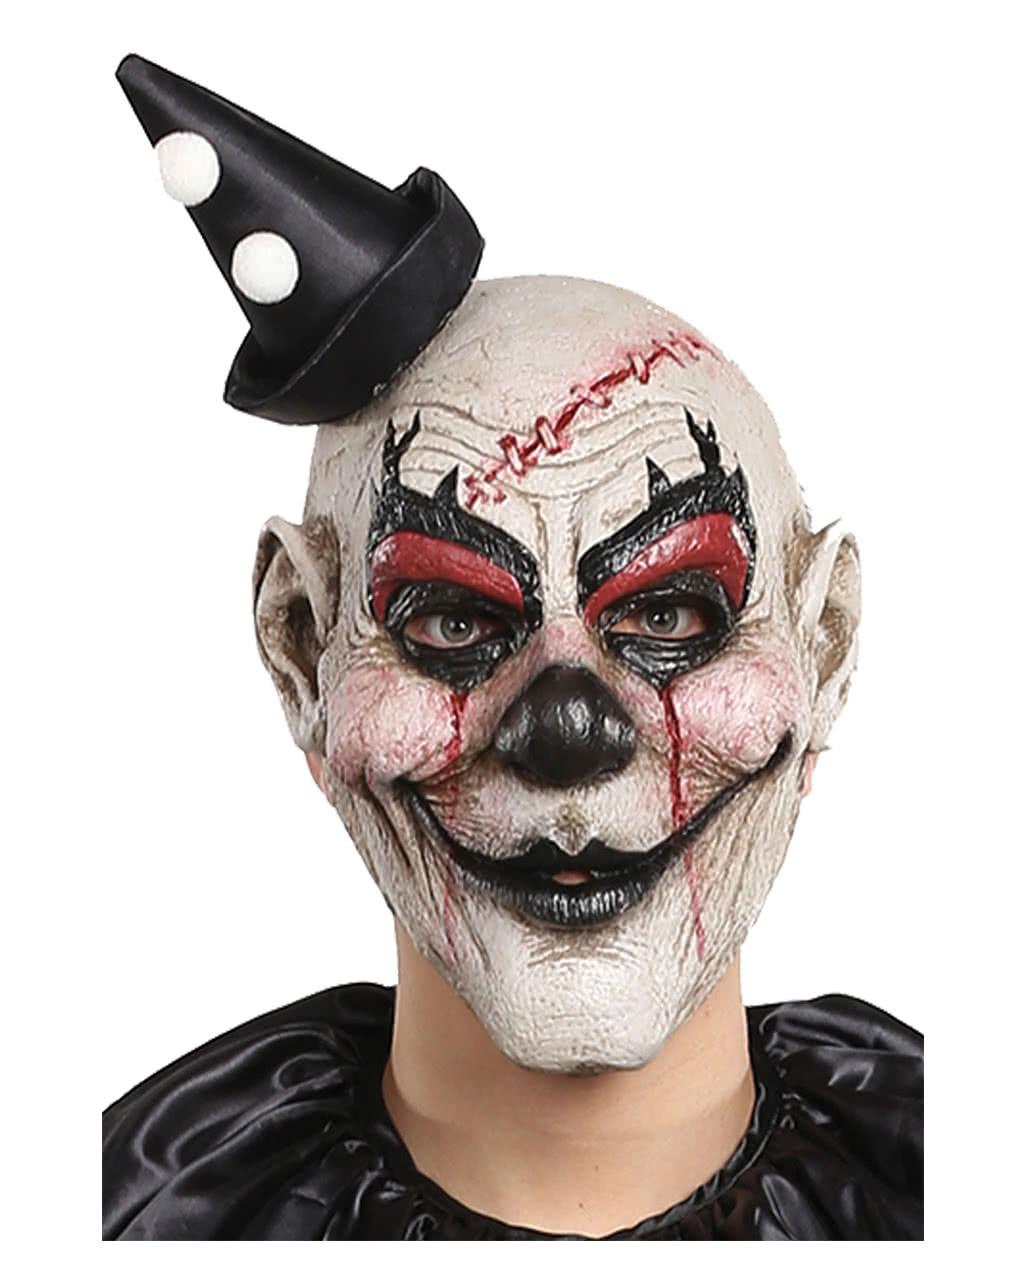 Killjoy clown halloween mask horror clown mask horror - Masque halloween horreur ...